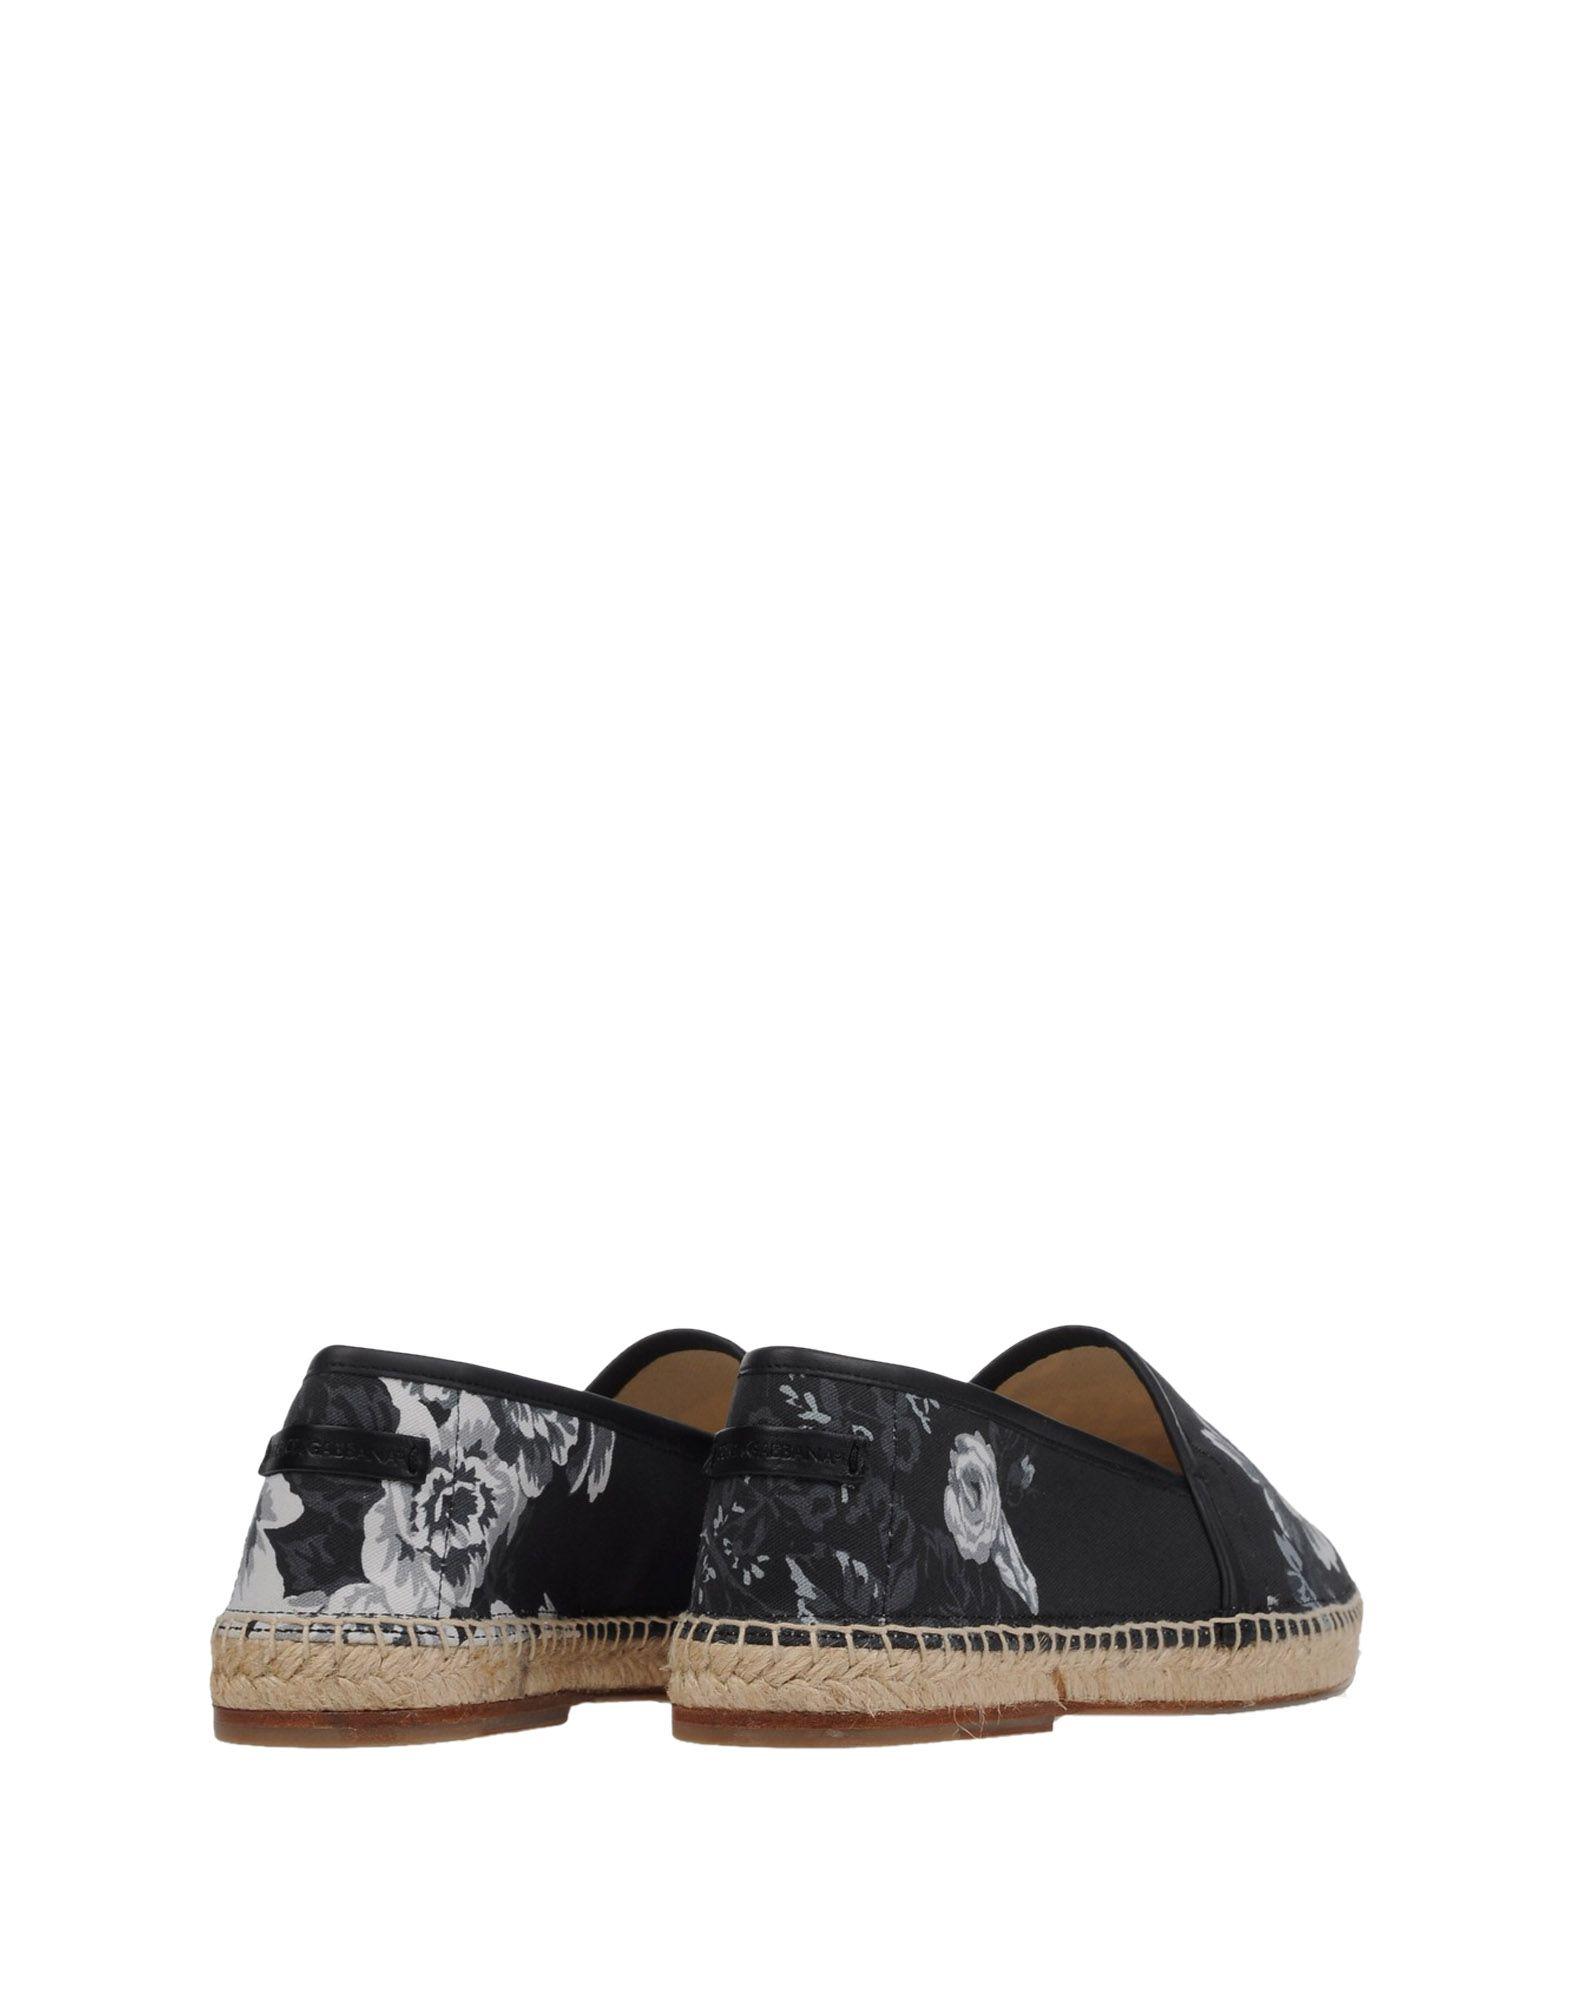 Dolce & Gabbana Espadrilles Herren  11121869QE Gute Qualität beliebte Schuhe